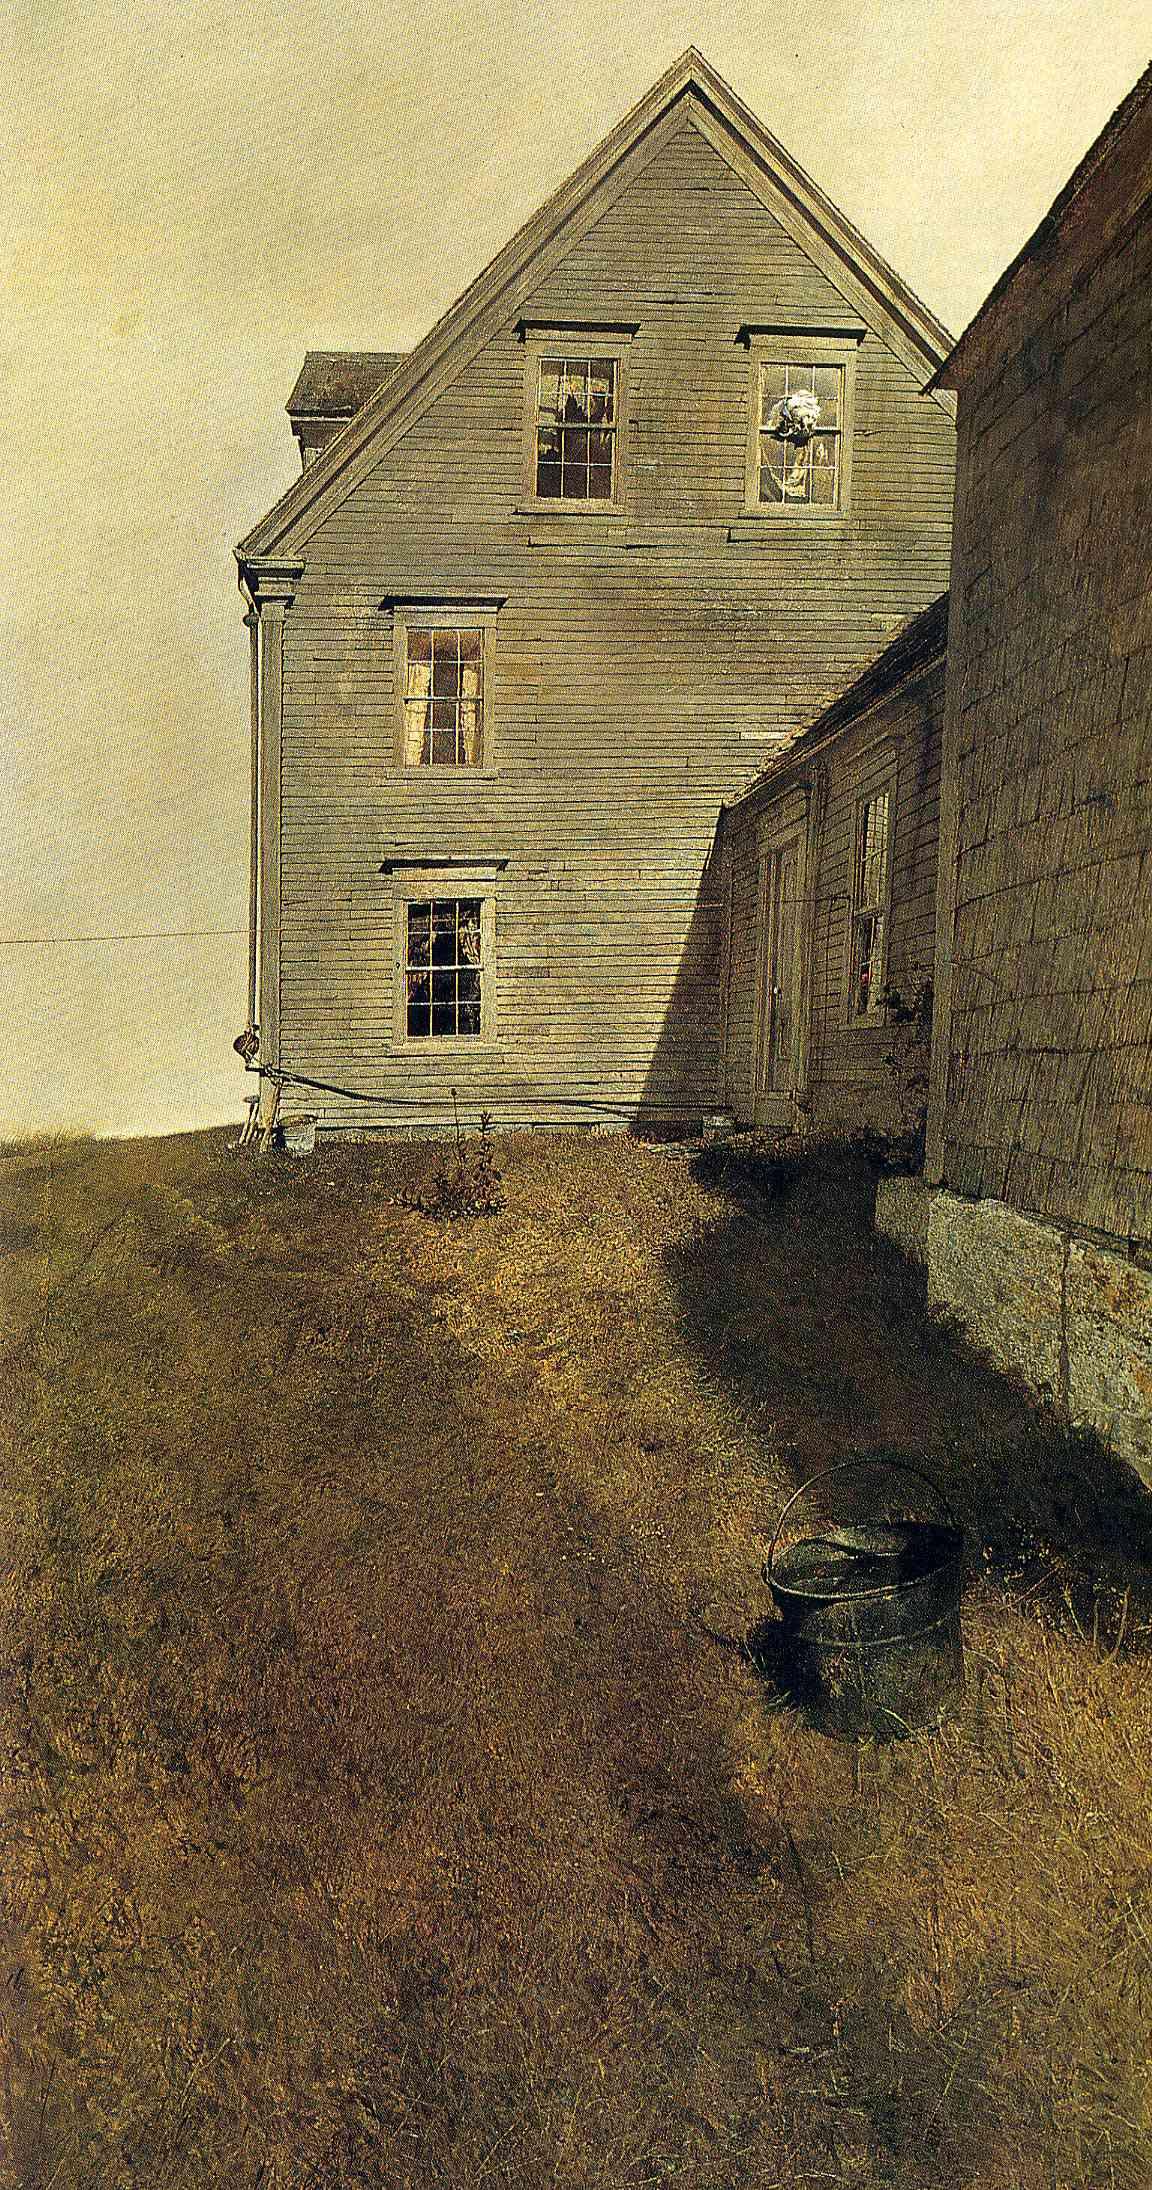 Andrew Wyeth. The windward side